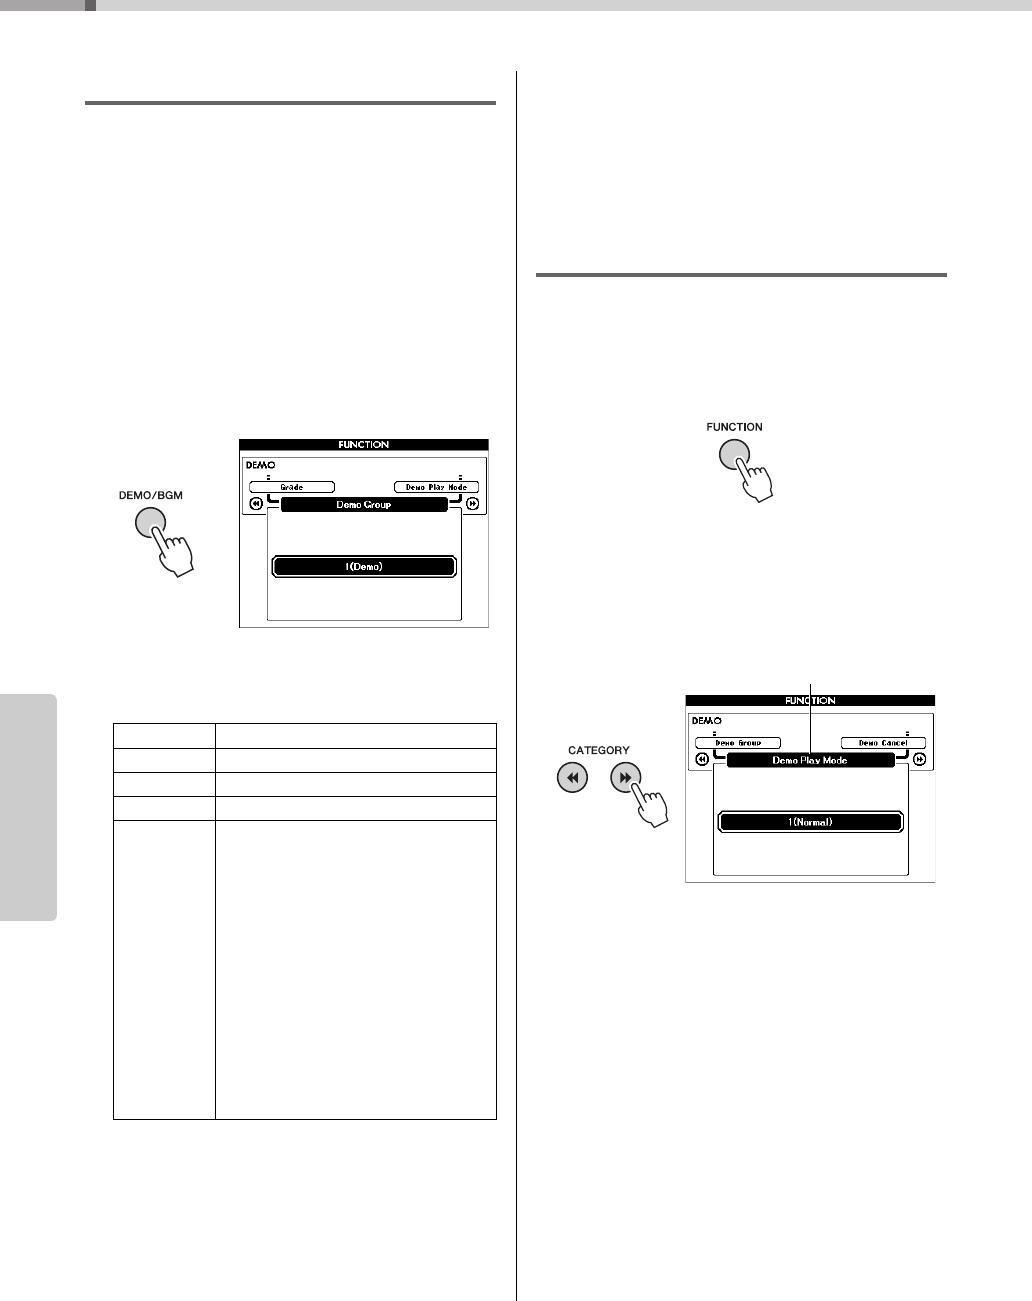 dxg technology dgx 660 owners manual download page 66 rh rsmanuals com DXG Model 305V DXG -572V Manual